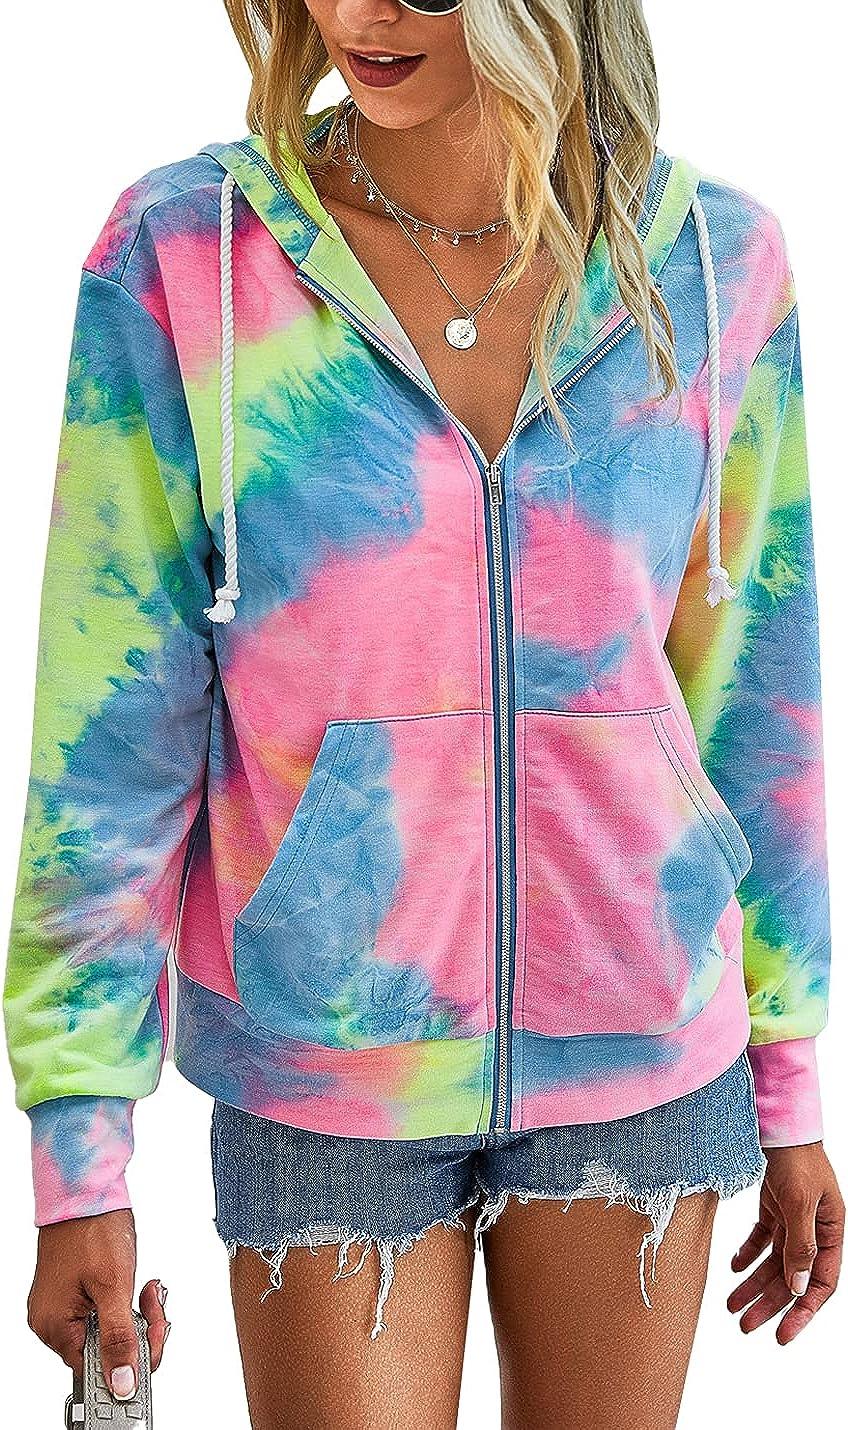 Flygo Women's Tie Dye Full Zip Hoodie Workout Active Long Sleeve Sweatshirt Casual Jacket